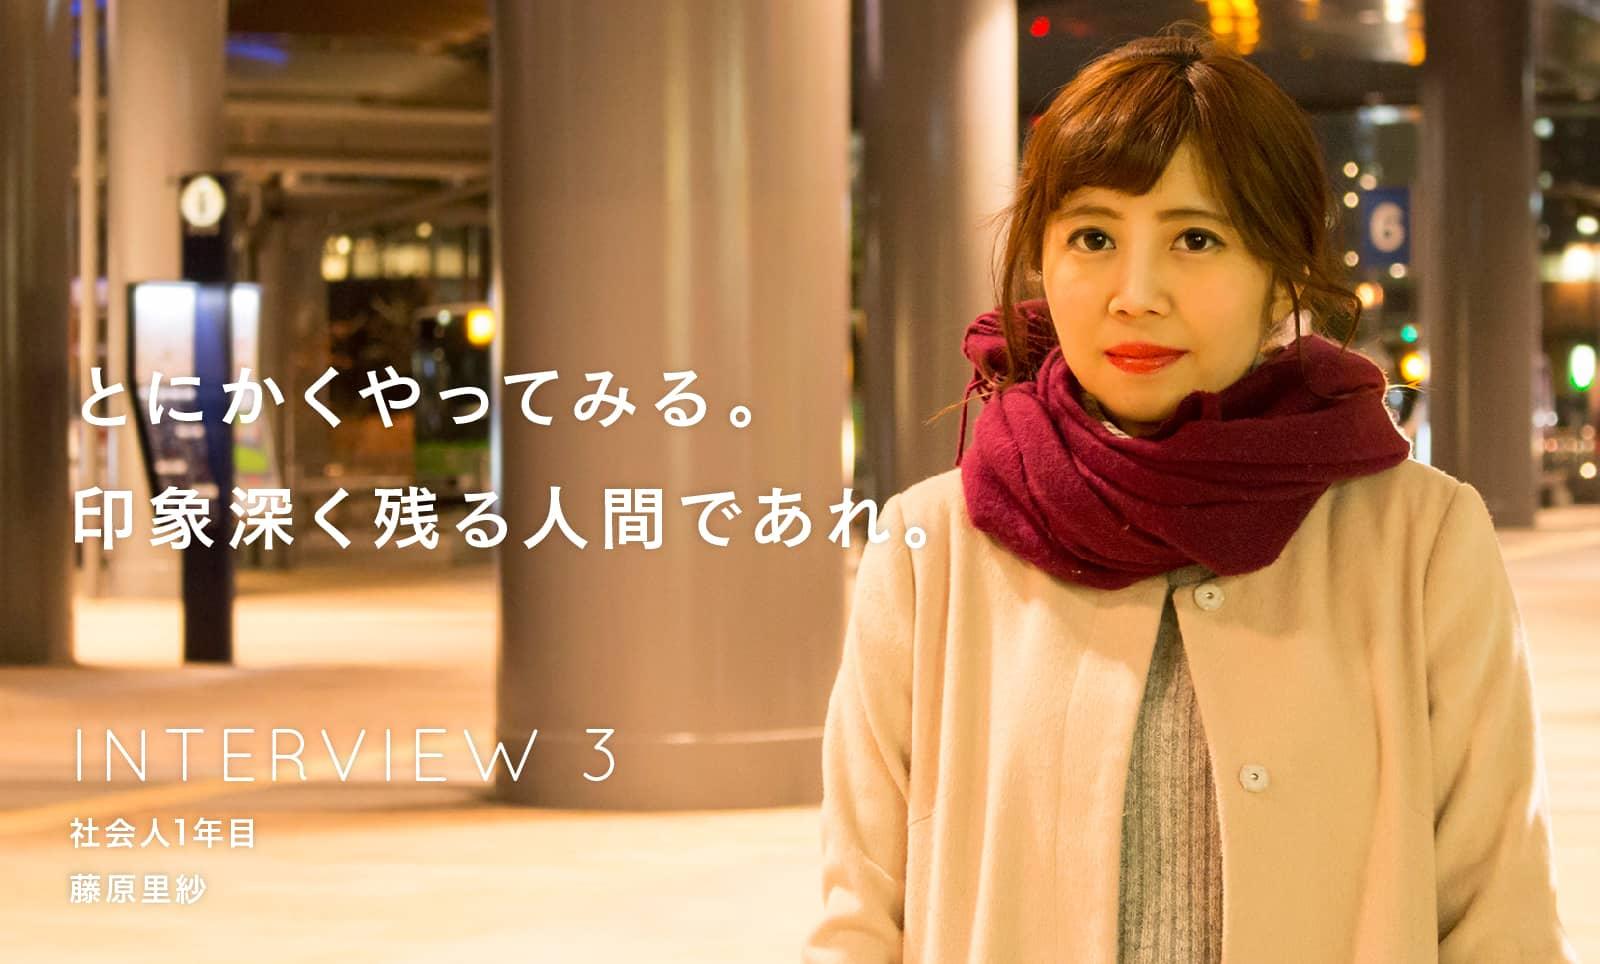 INTERVIEW 02 大手製薬会社 藤原里紗さん